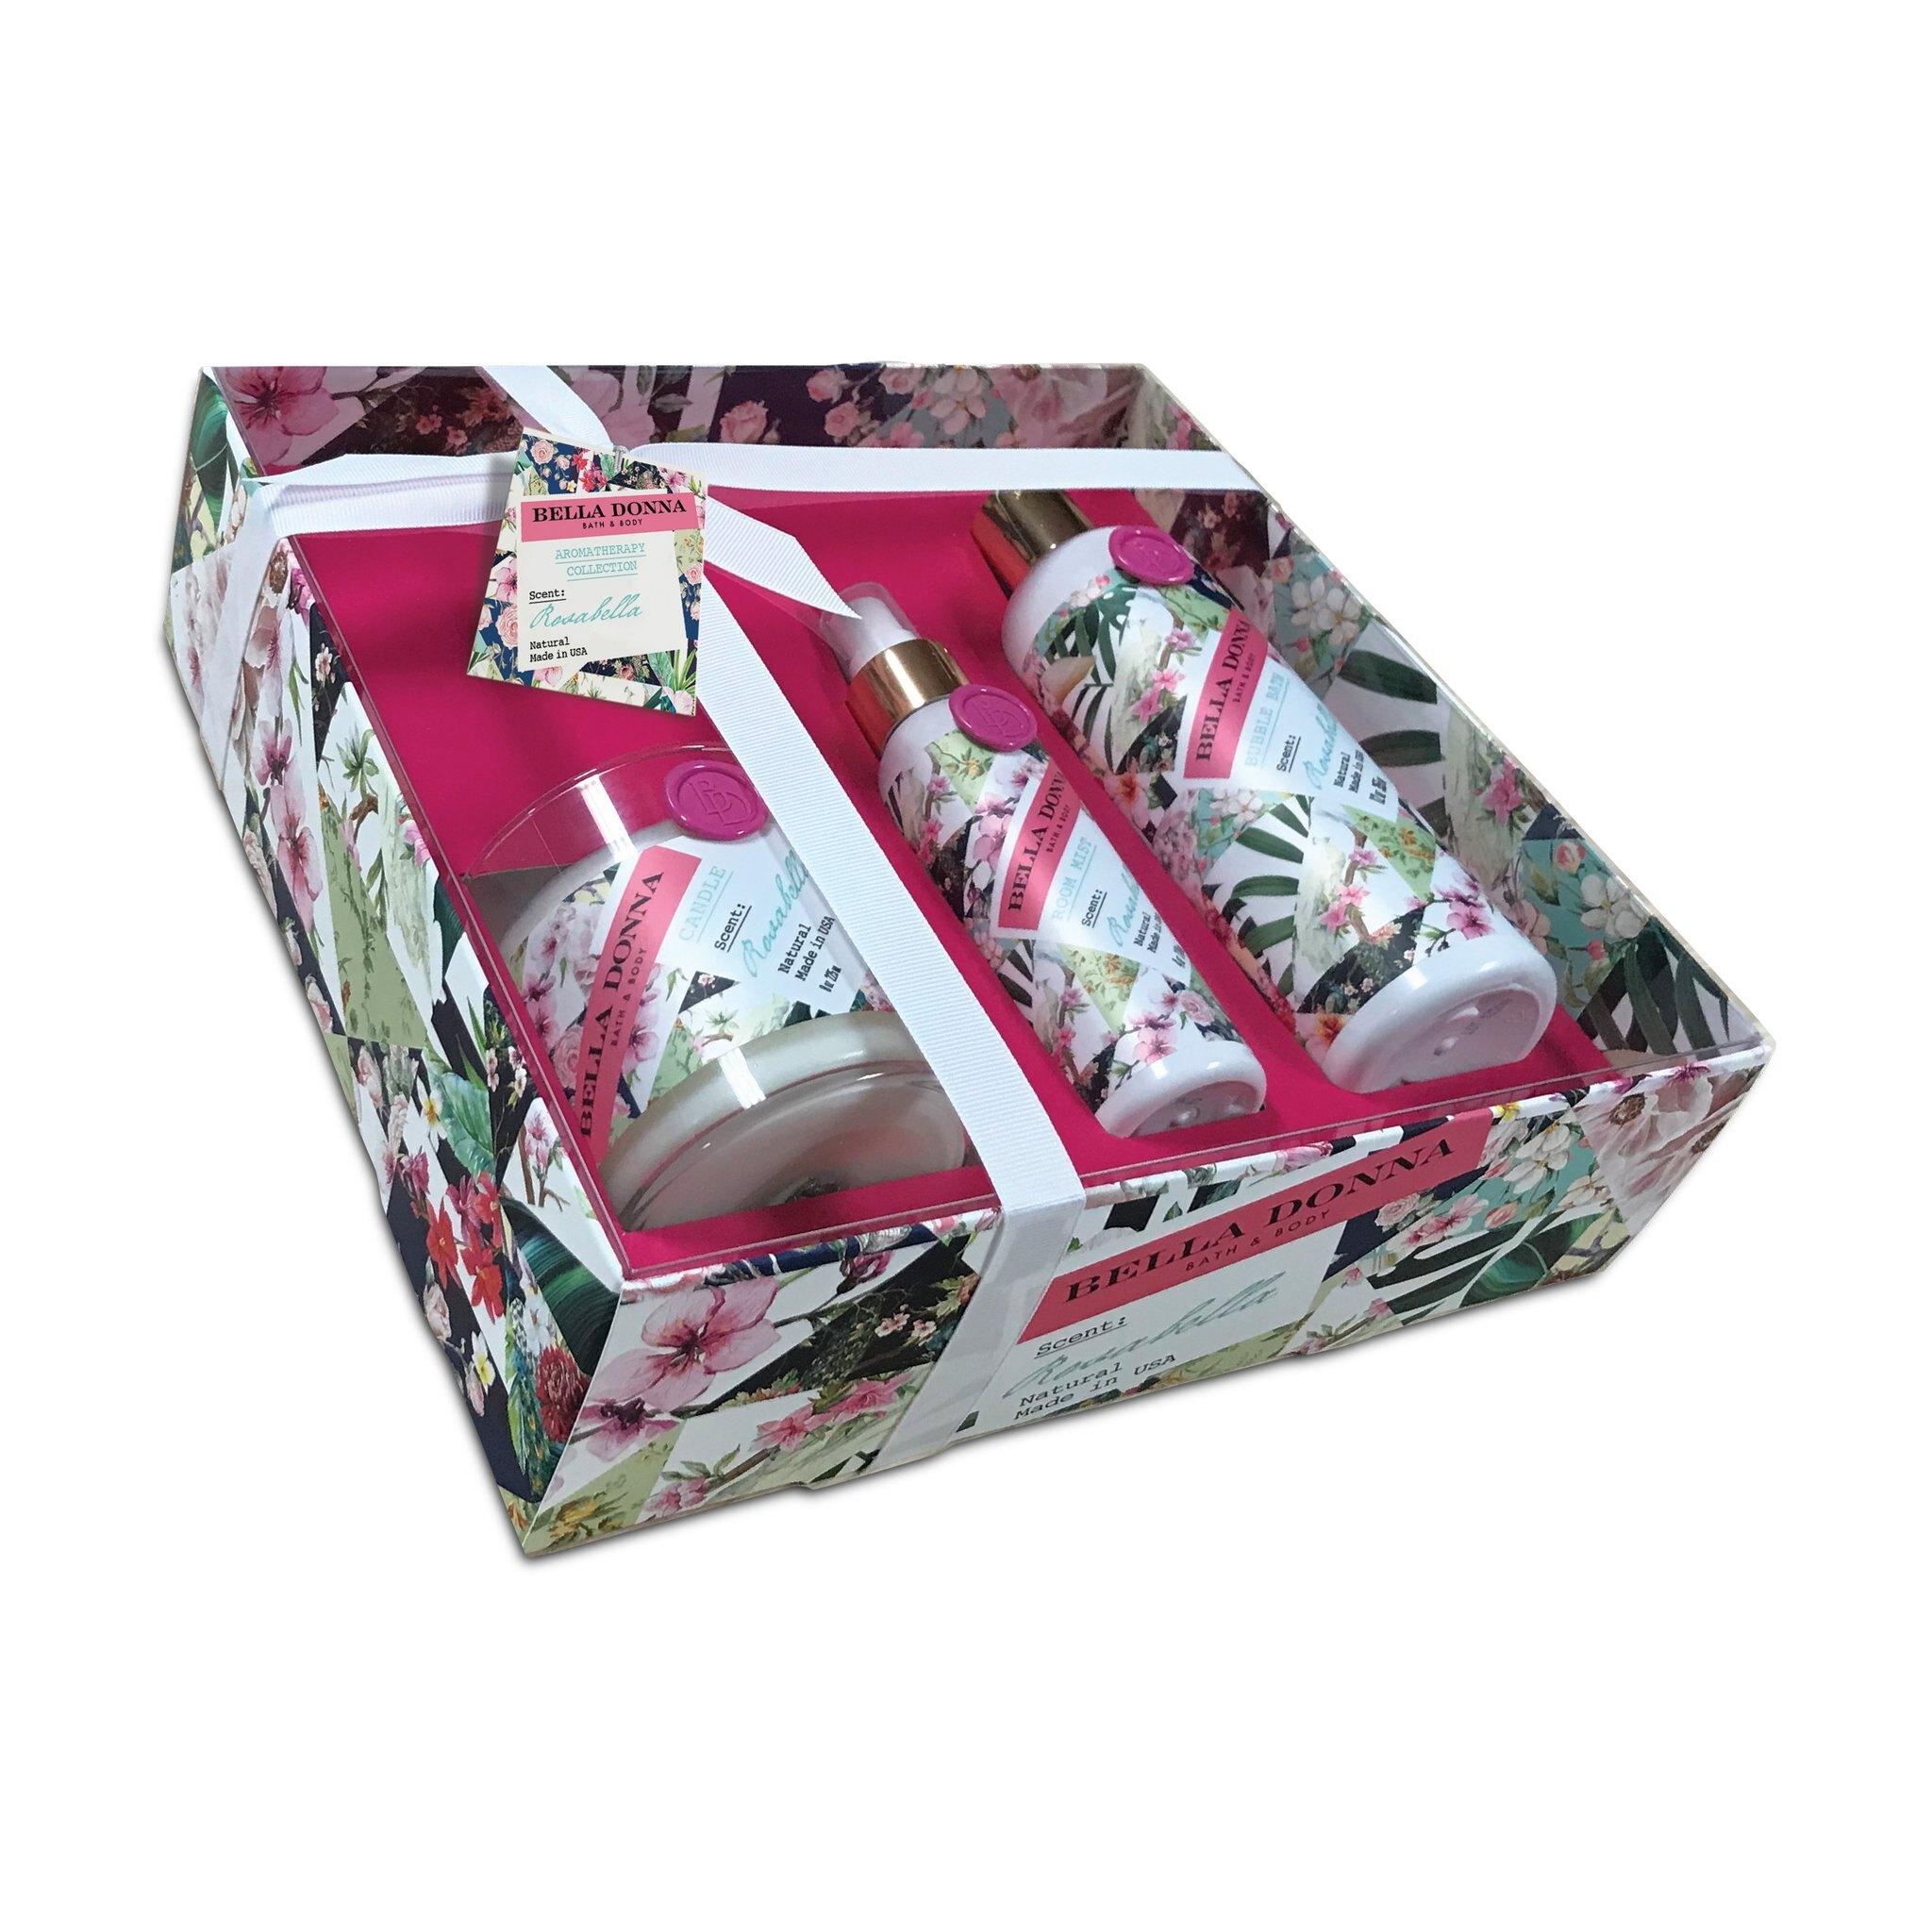 【Bella Donna】香氛禮盒 (魅惑玫瑰)